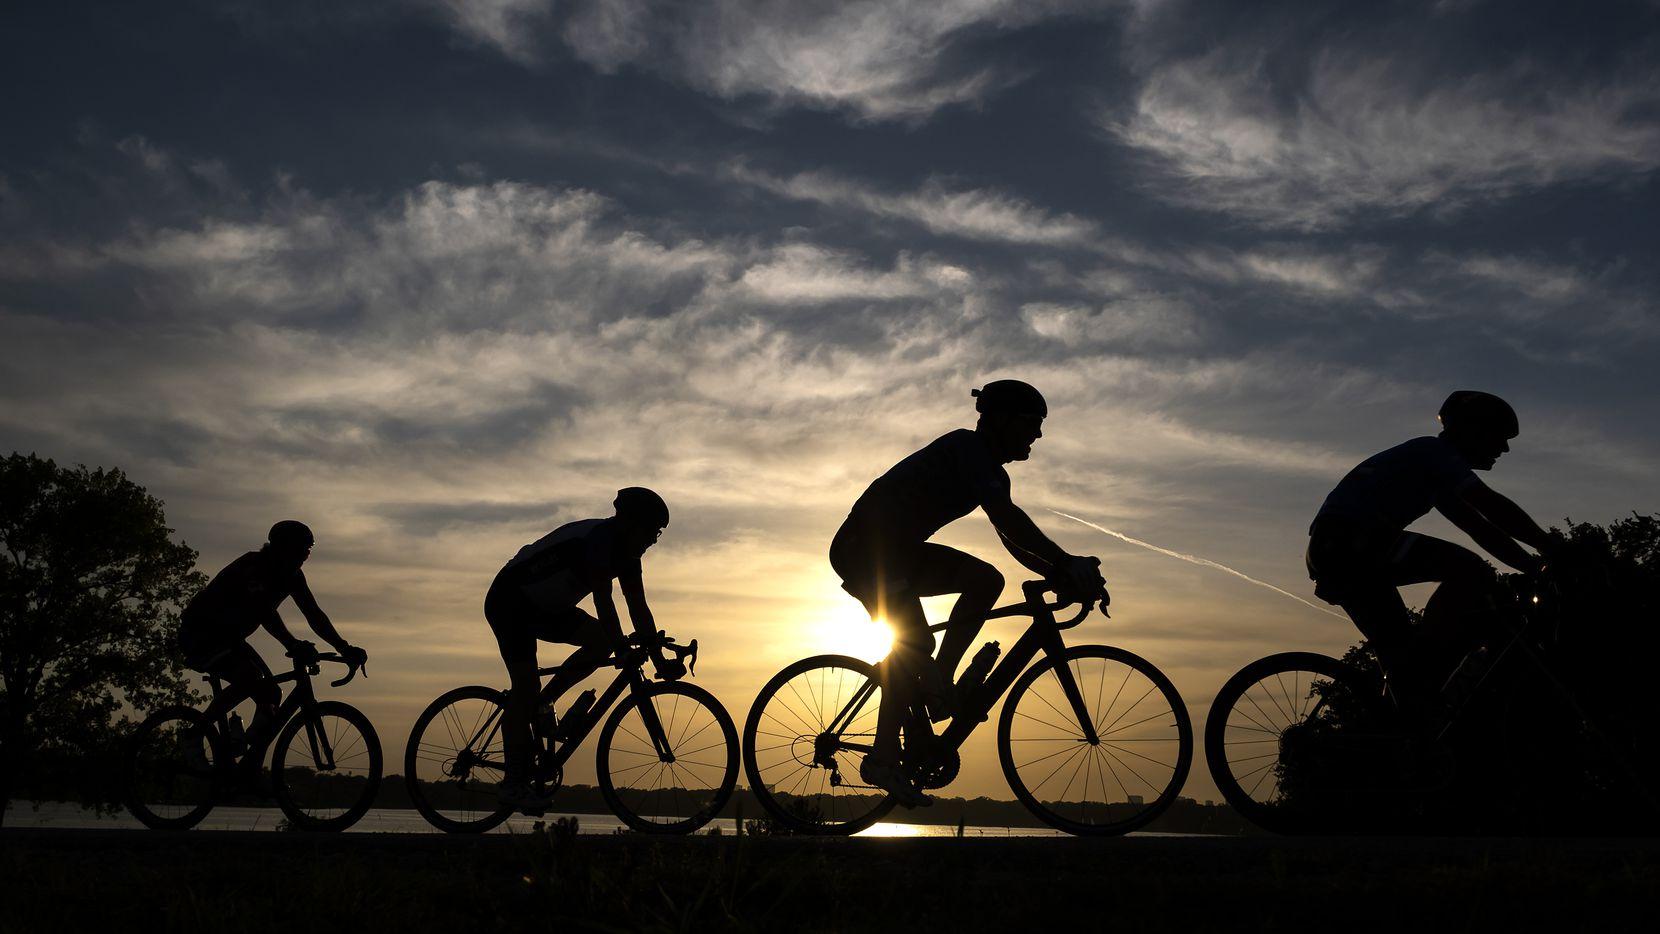 Ciclistas se unirán este fin de semana para celebrar San Valentín sobre ruedas.